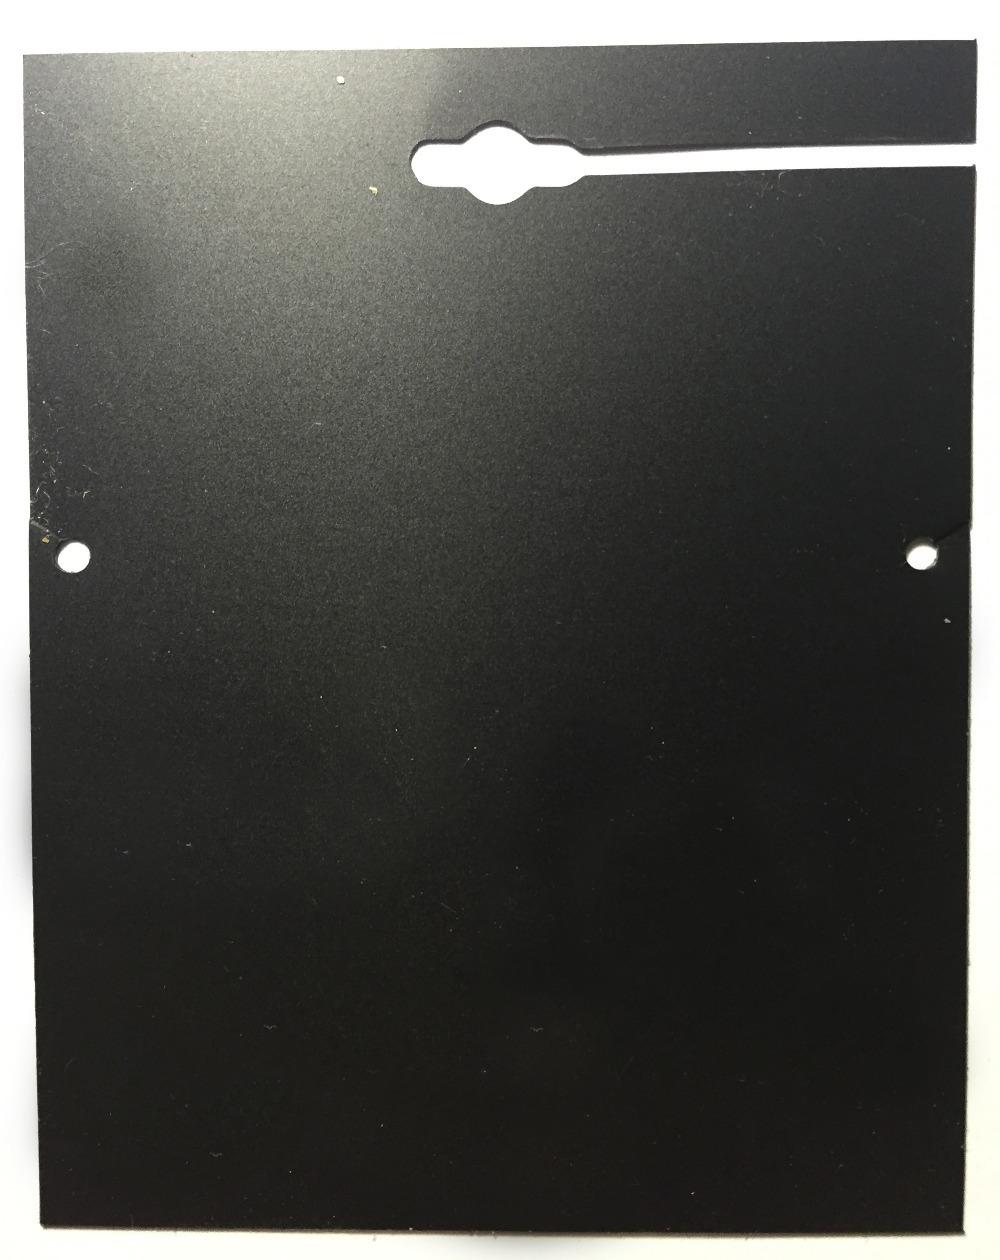 8.5x11.6cm 2000pec/lot Custom Logo Black Personalized Jewlery Card Plastic Necklace Display Card Display Wholesale JC#0069(China (Mainland))